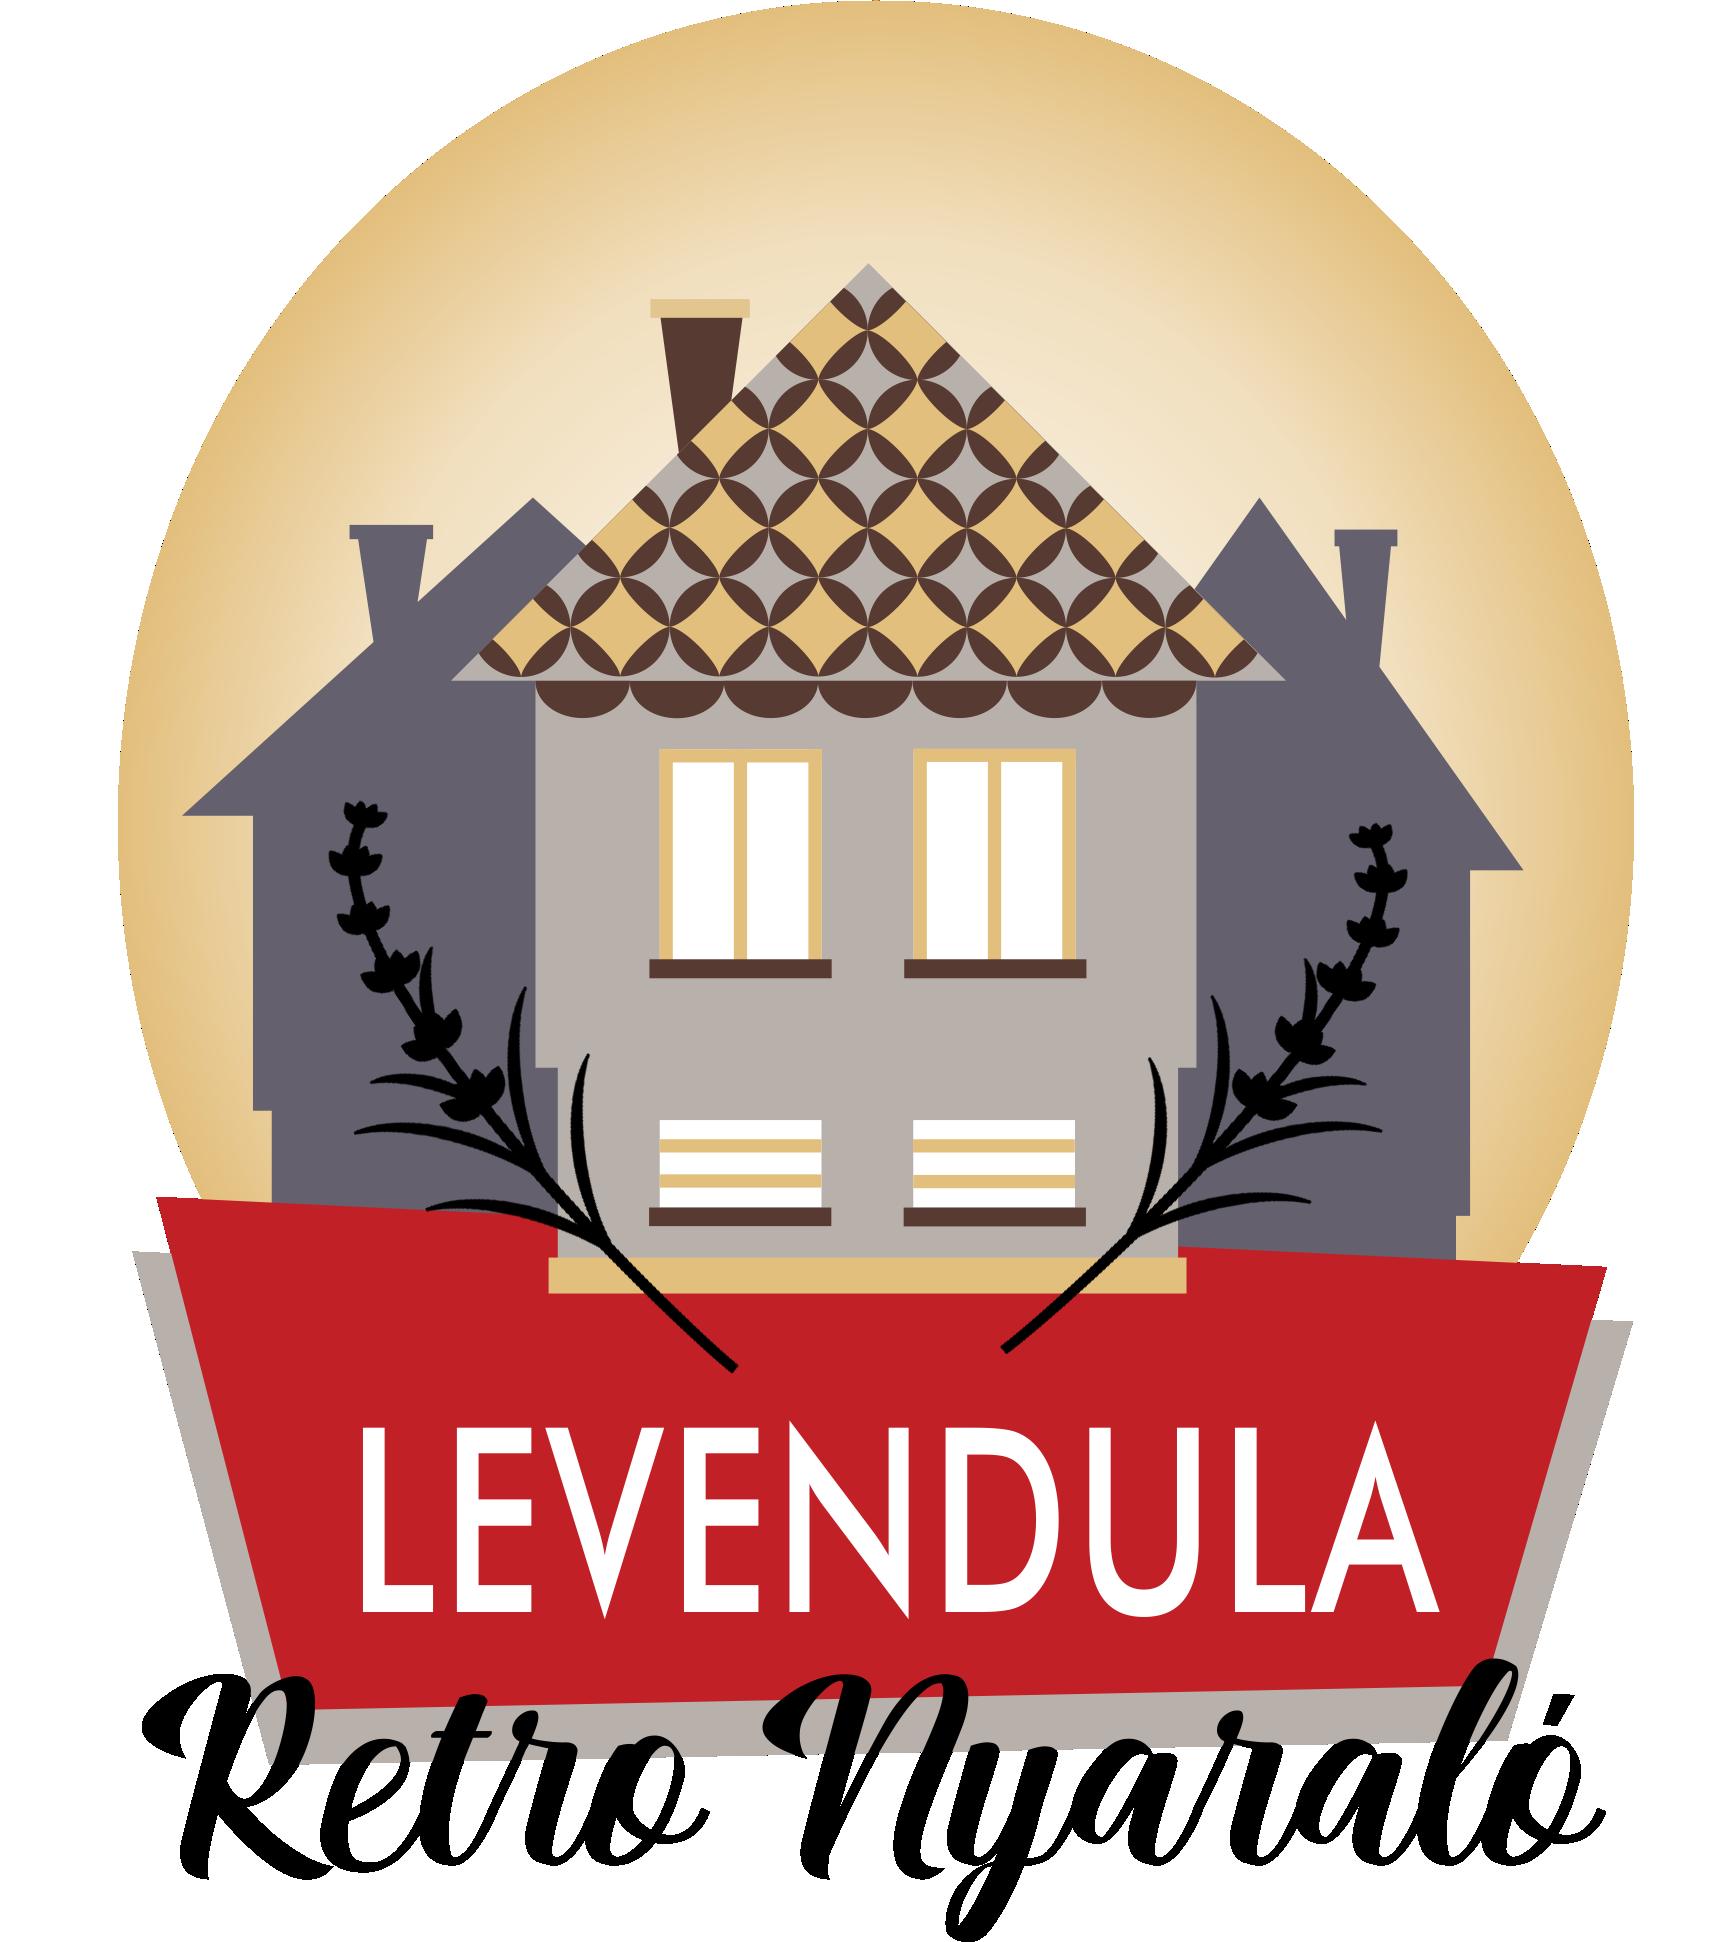 levendula_logo_hatteres.png